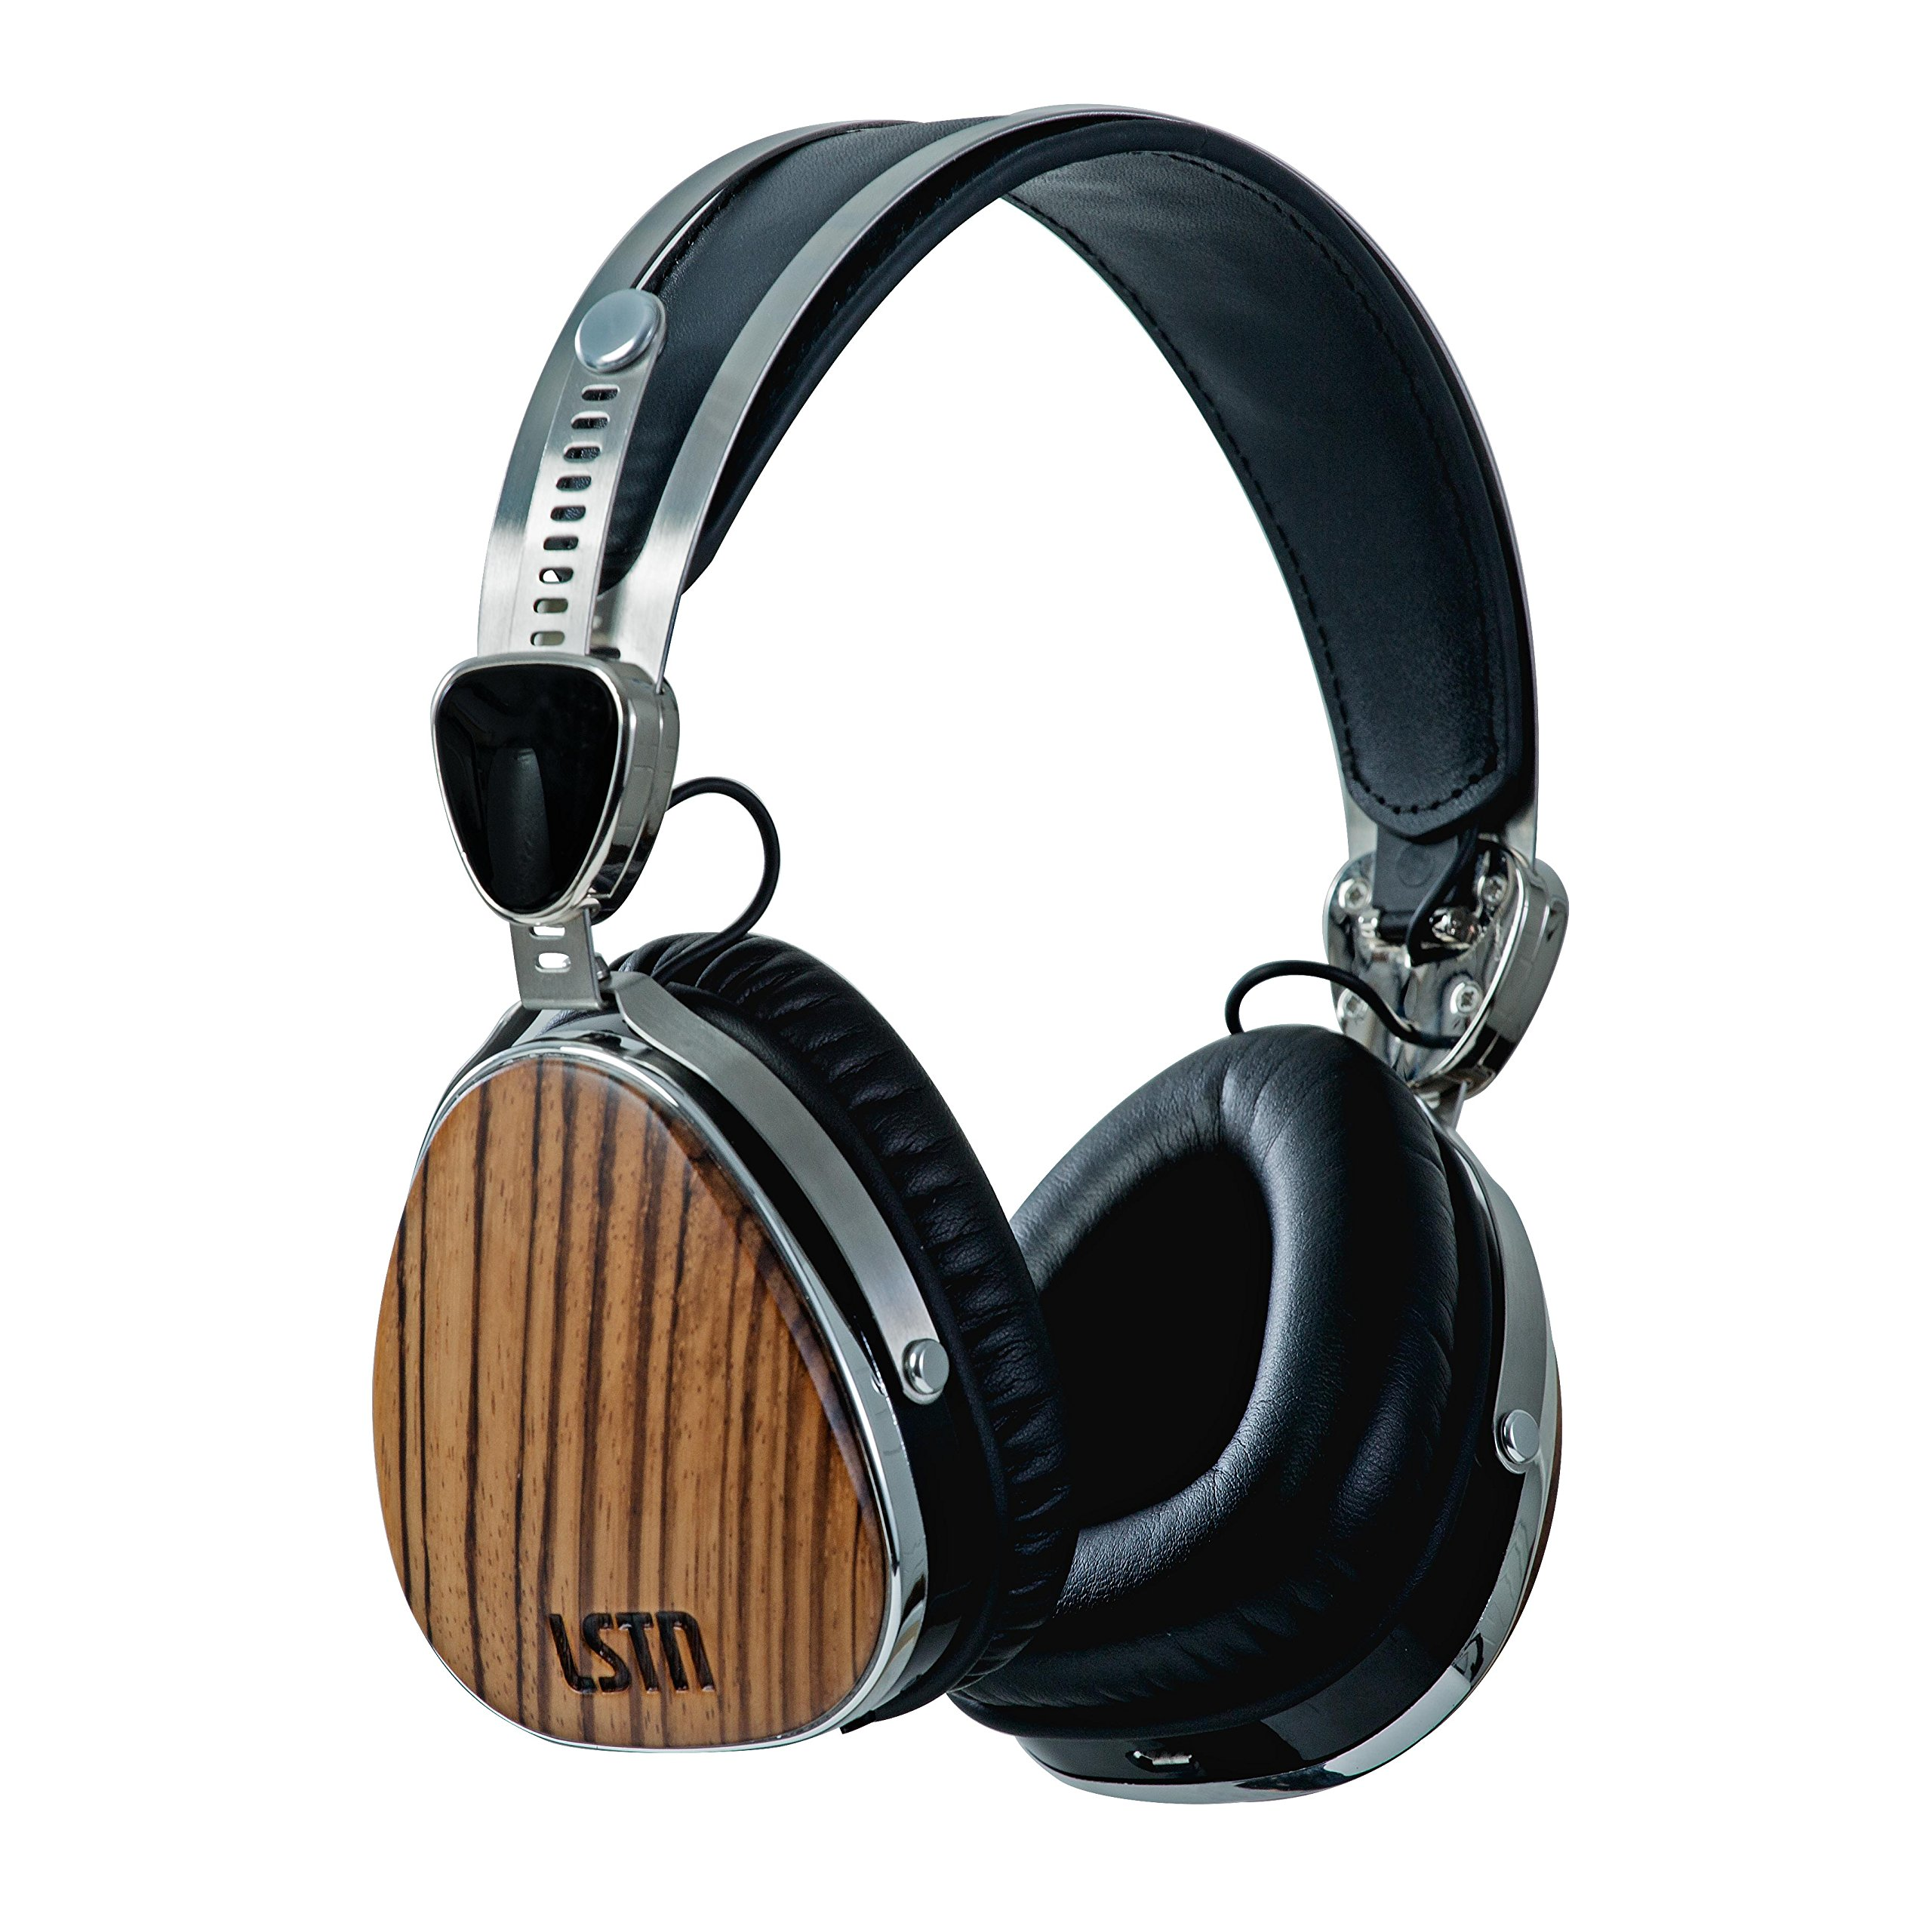 LSTN Wireless Troubadours Zebra Wood On-Ear Headphones with Built-In Microphone, Volume Controls